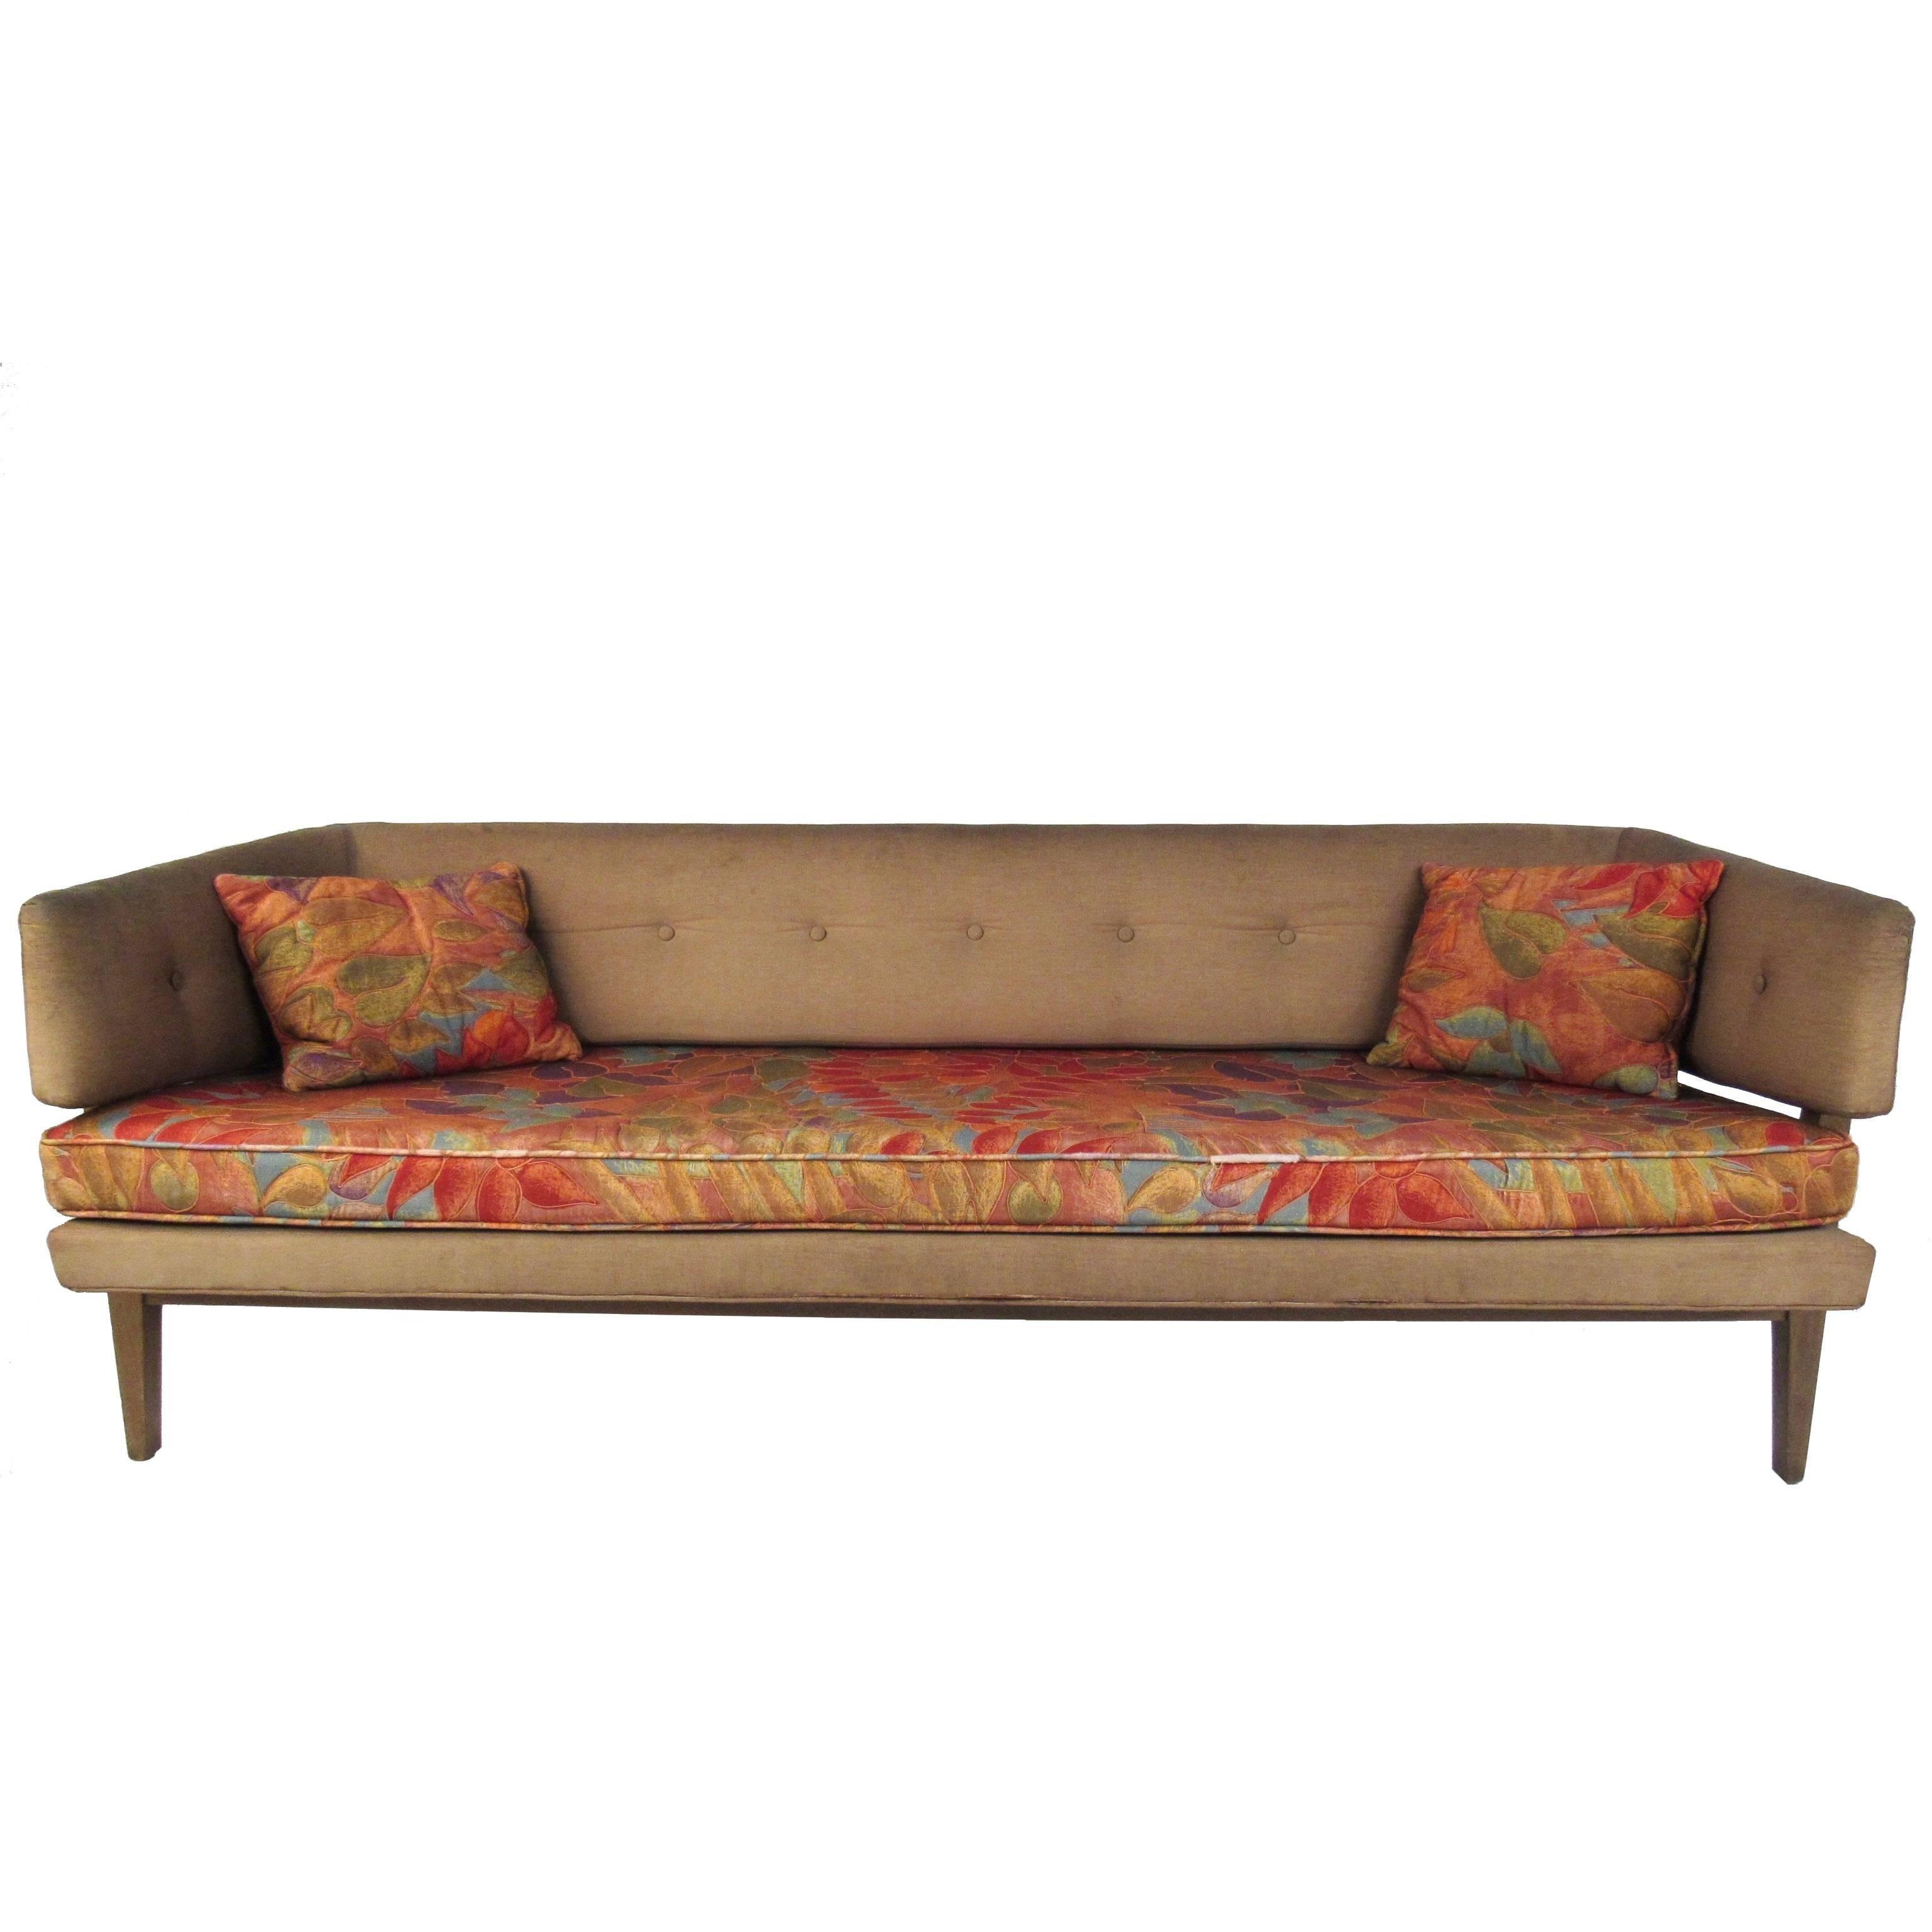 Mid-Century Edward Wormley Sculptural Sofa for Dunbar